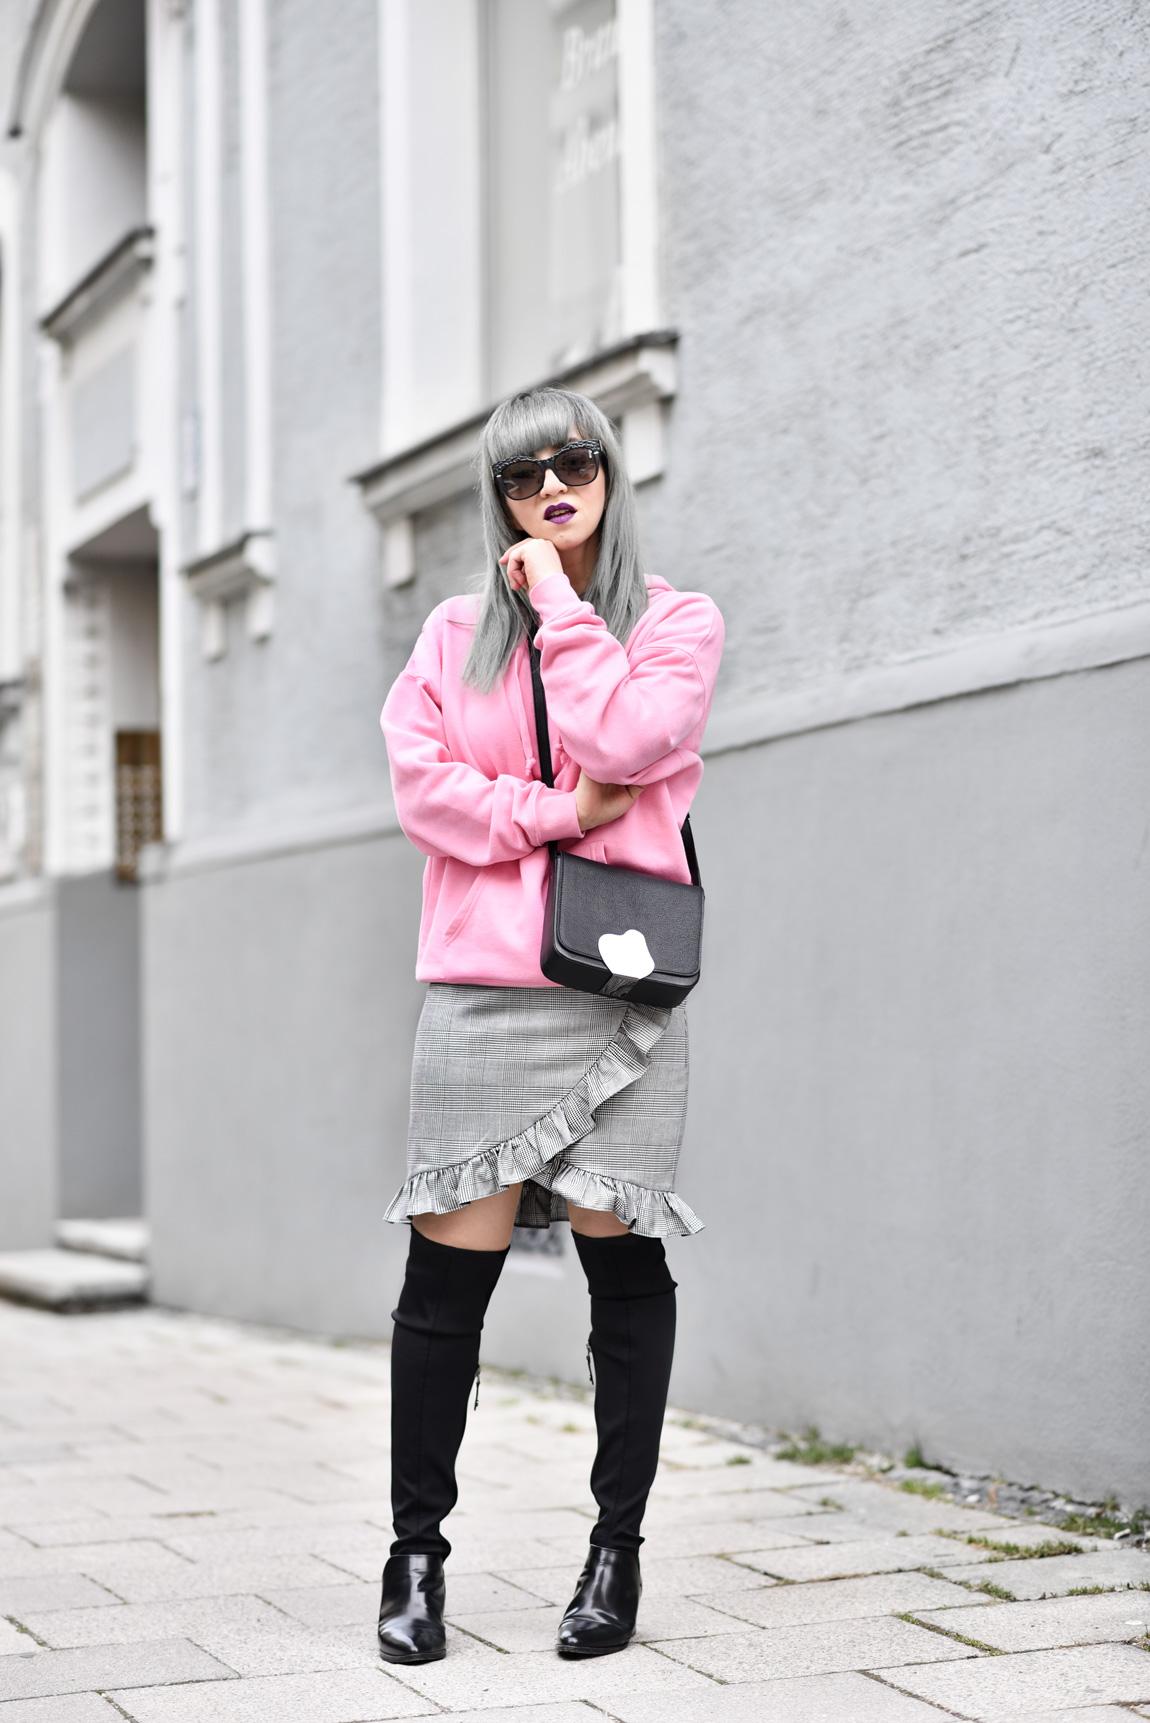 pink, rosa, rüschen, volant, gerüscht, outfit, mini, rock, hoodie, modeblogger, fashionblogger, nachgesternistvormorgen, streetstyle, trend